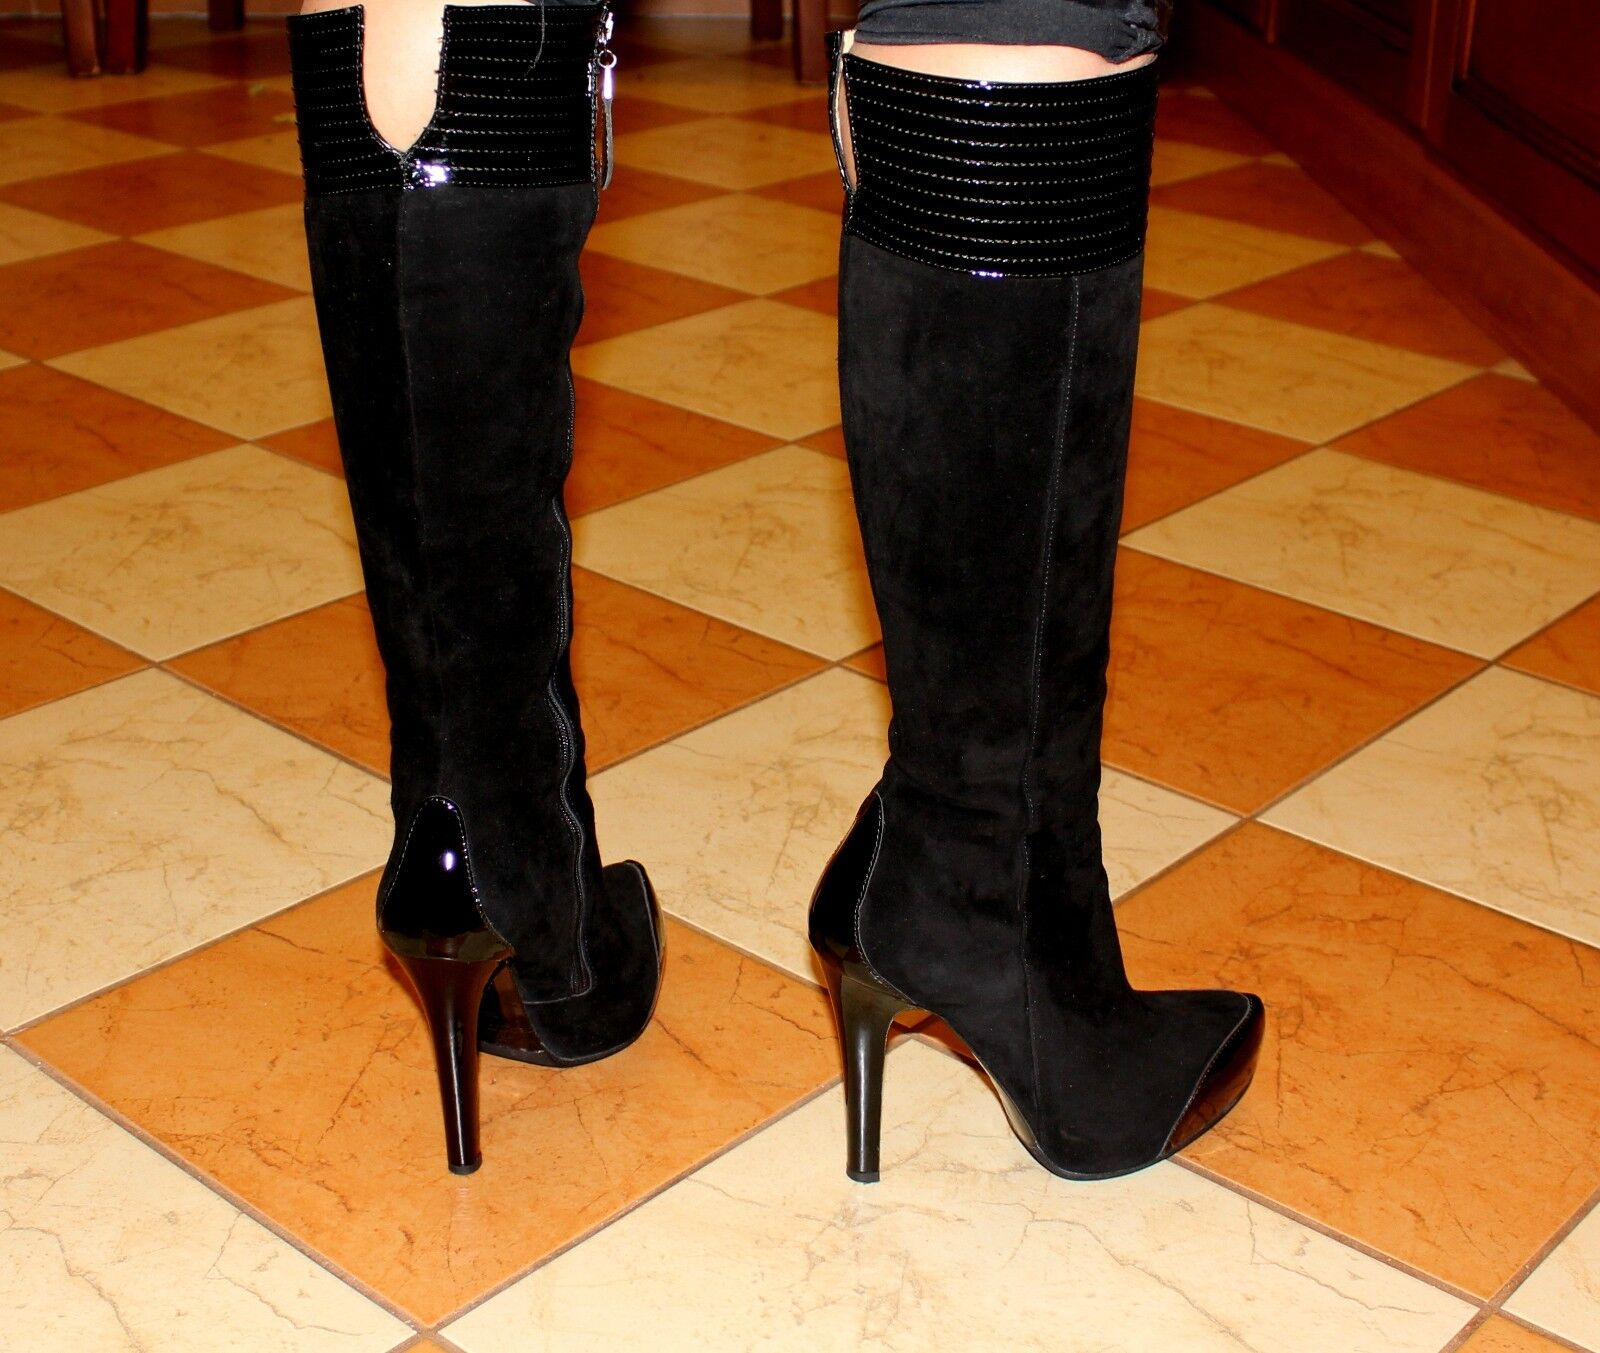 Gianmarco Lorenzi authentic designer damen suede patent leather Stiefel Stiefel Stiefel heels sz 5 6f30c2